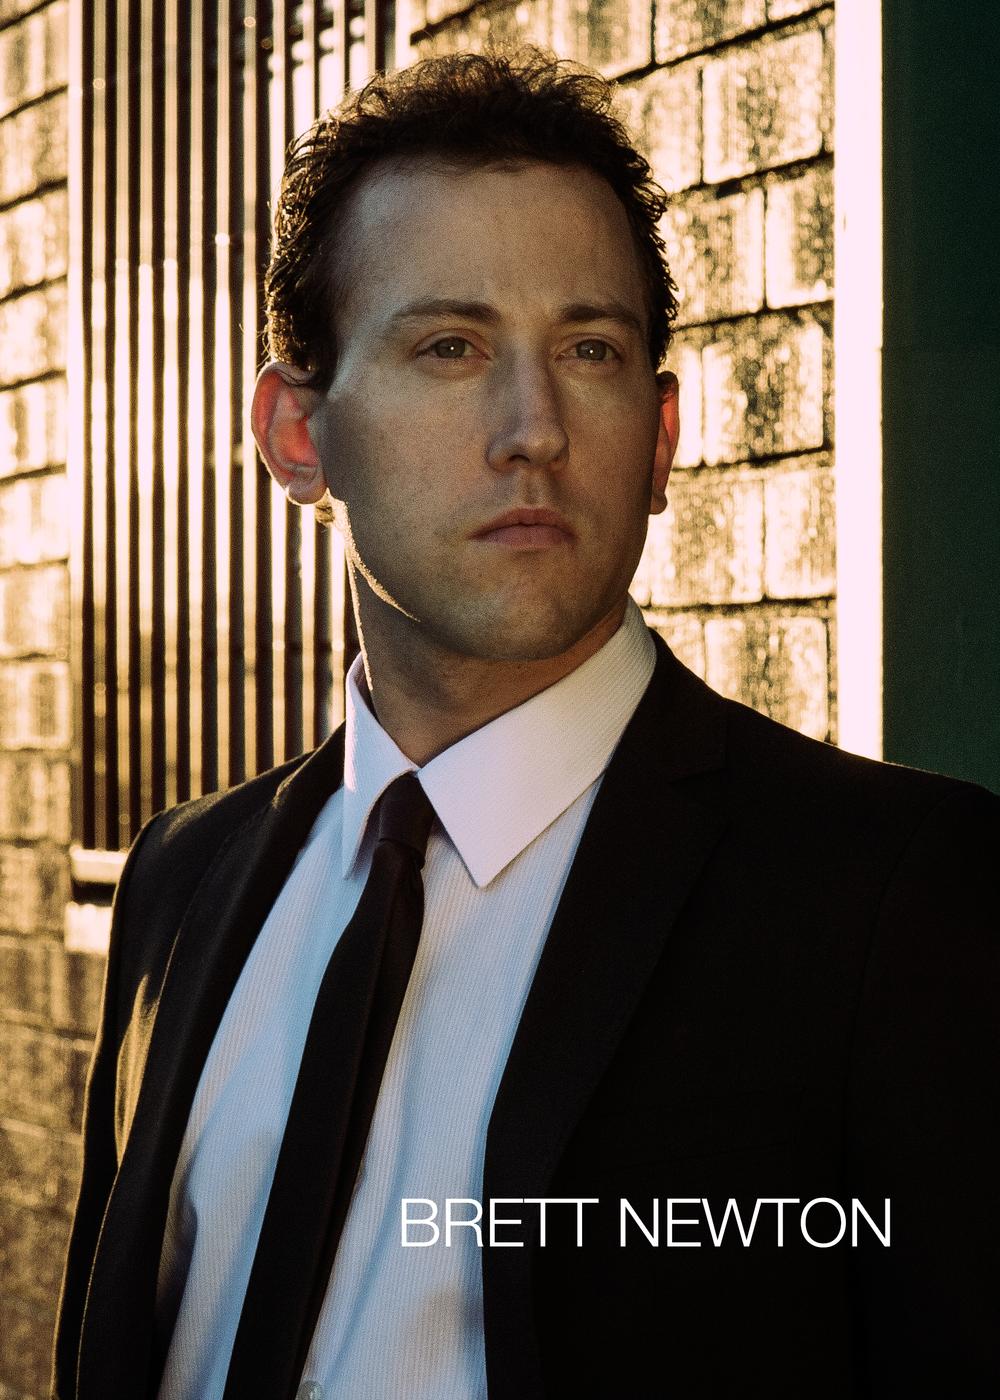 Brett Newton - Producer - Production Manager - Camera